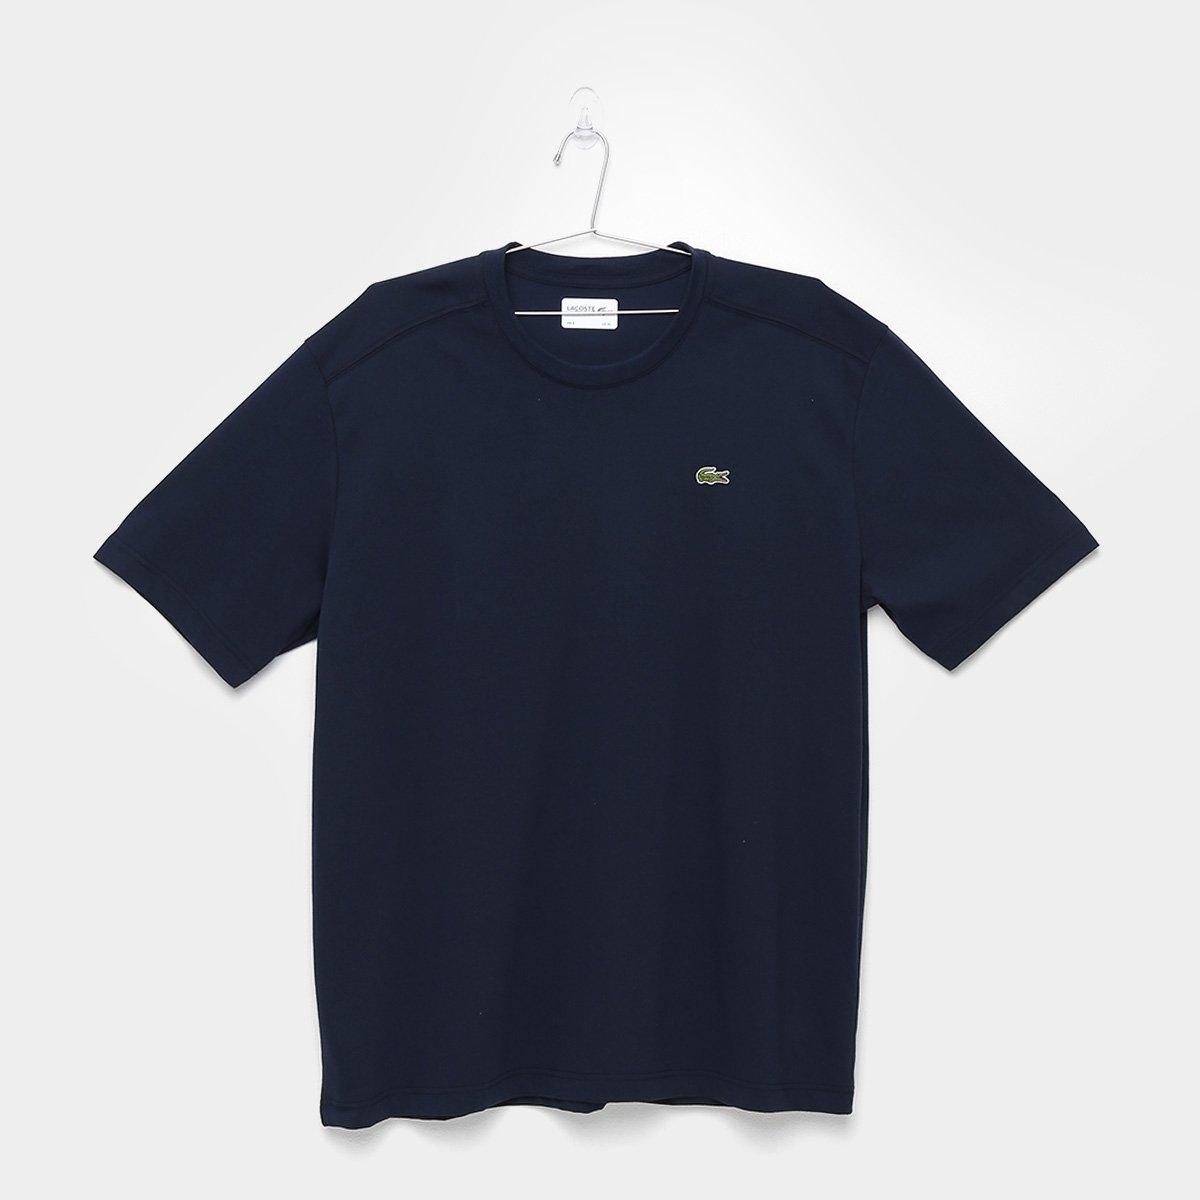 aefecc733335f Camiseta Lacoste Gola Careca - Marinho - Compre Agora   Zattini